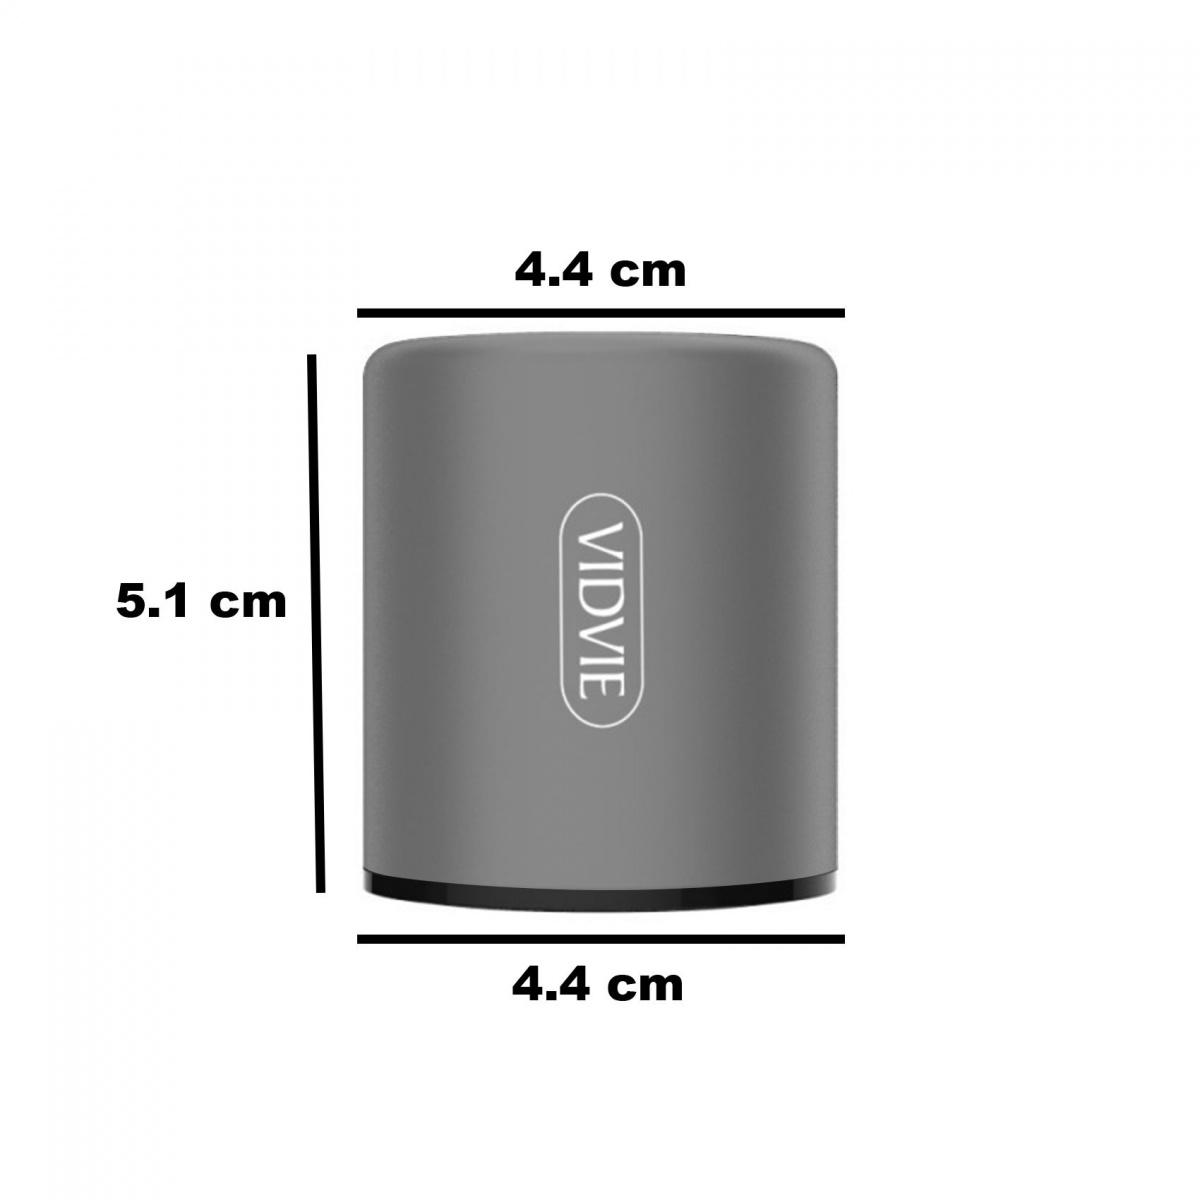 Vidvie SP909 Mini TWS Speaker - Gray